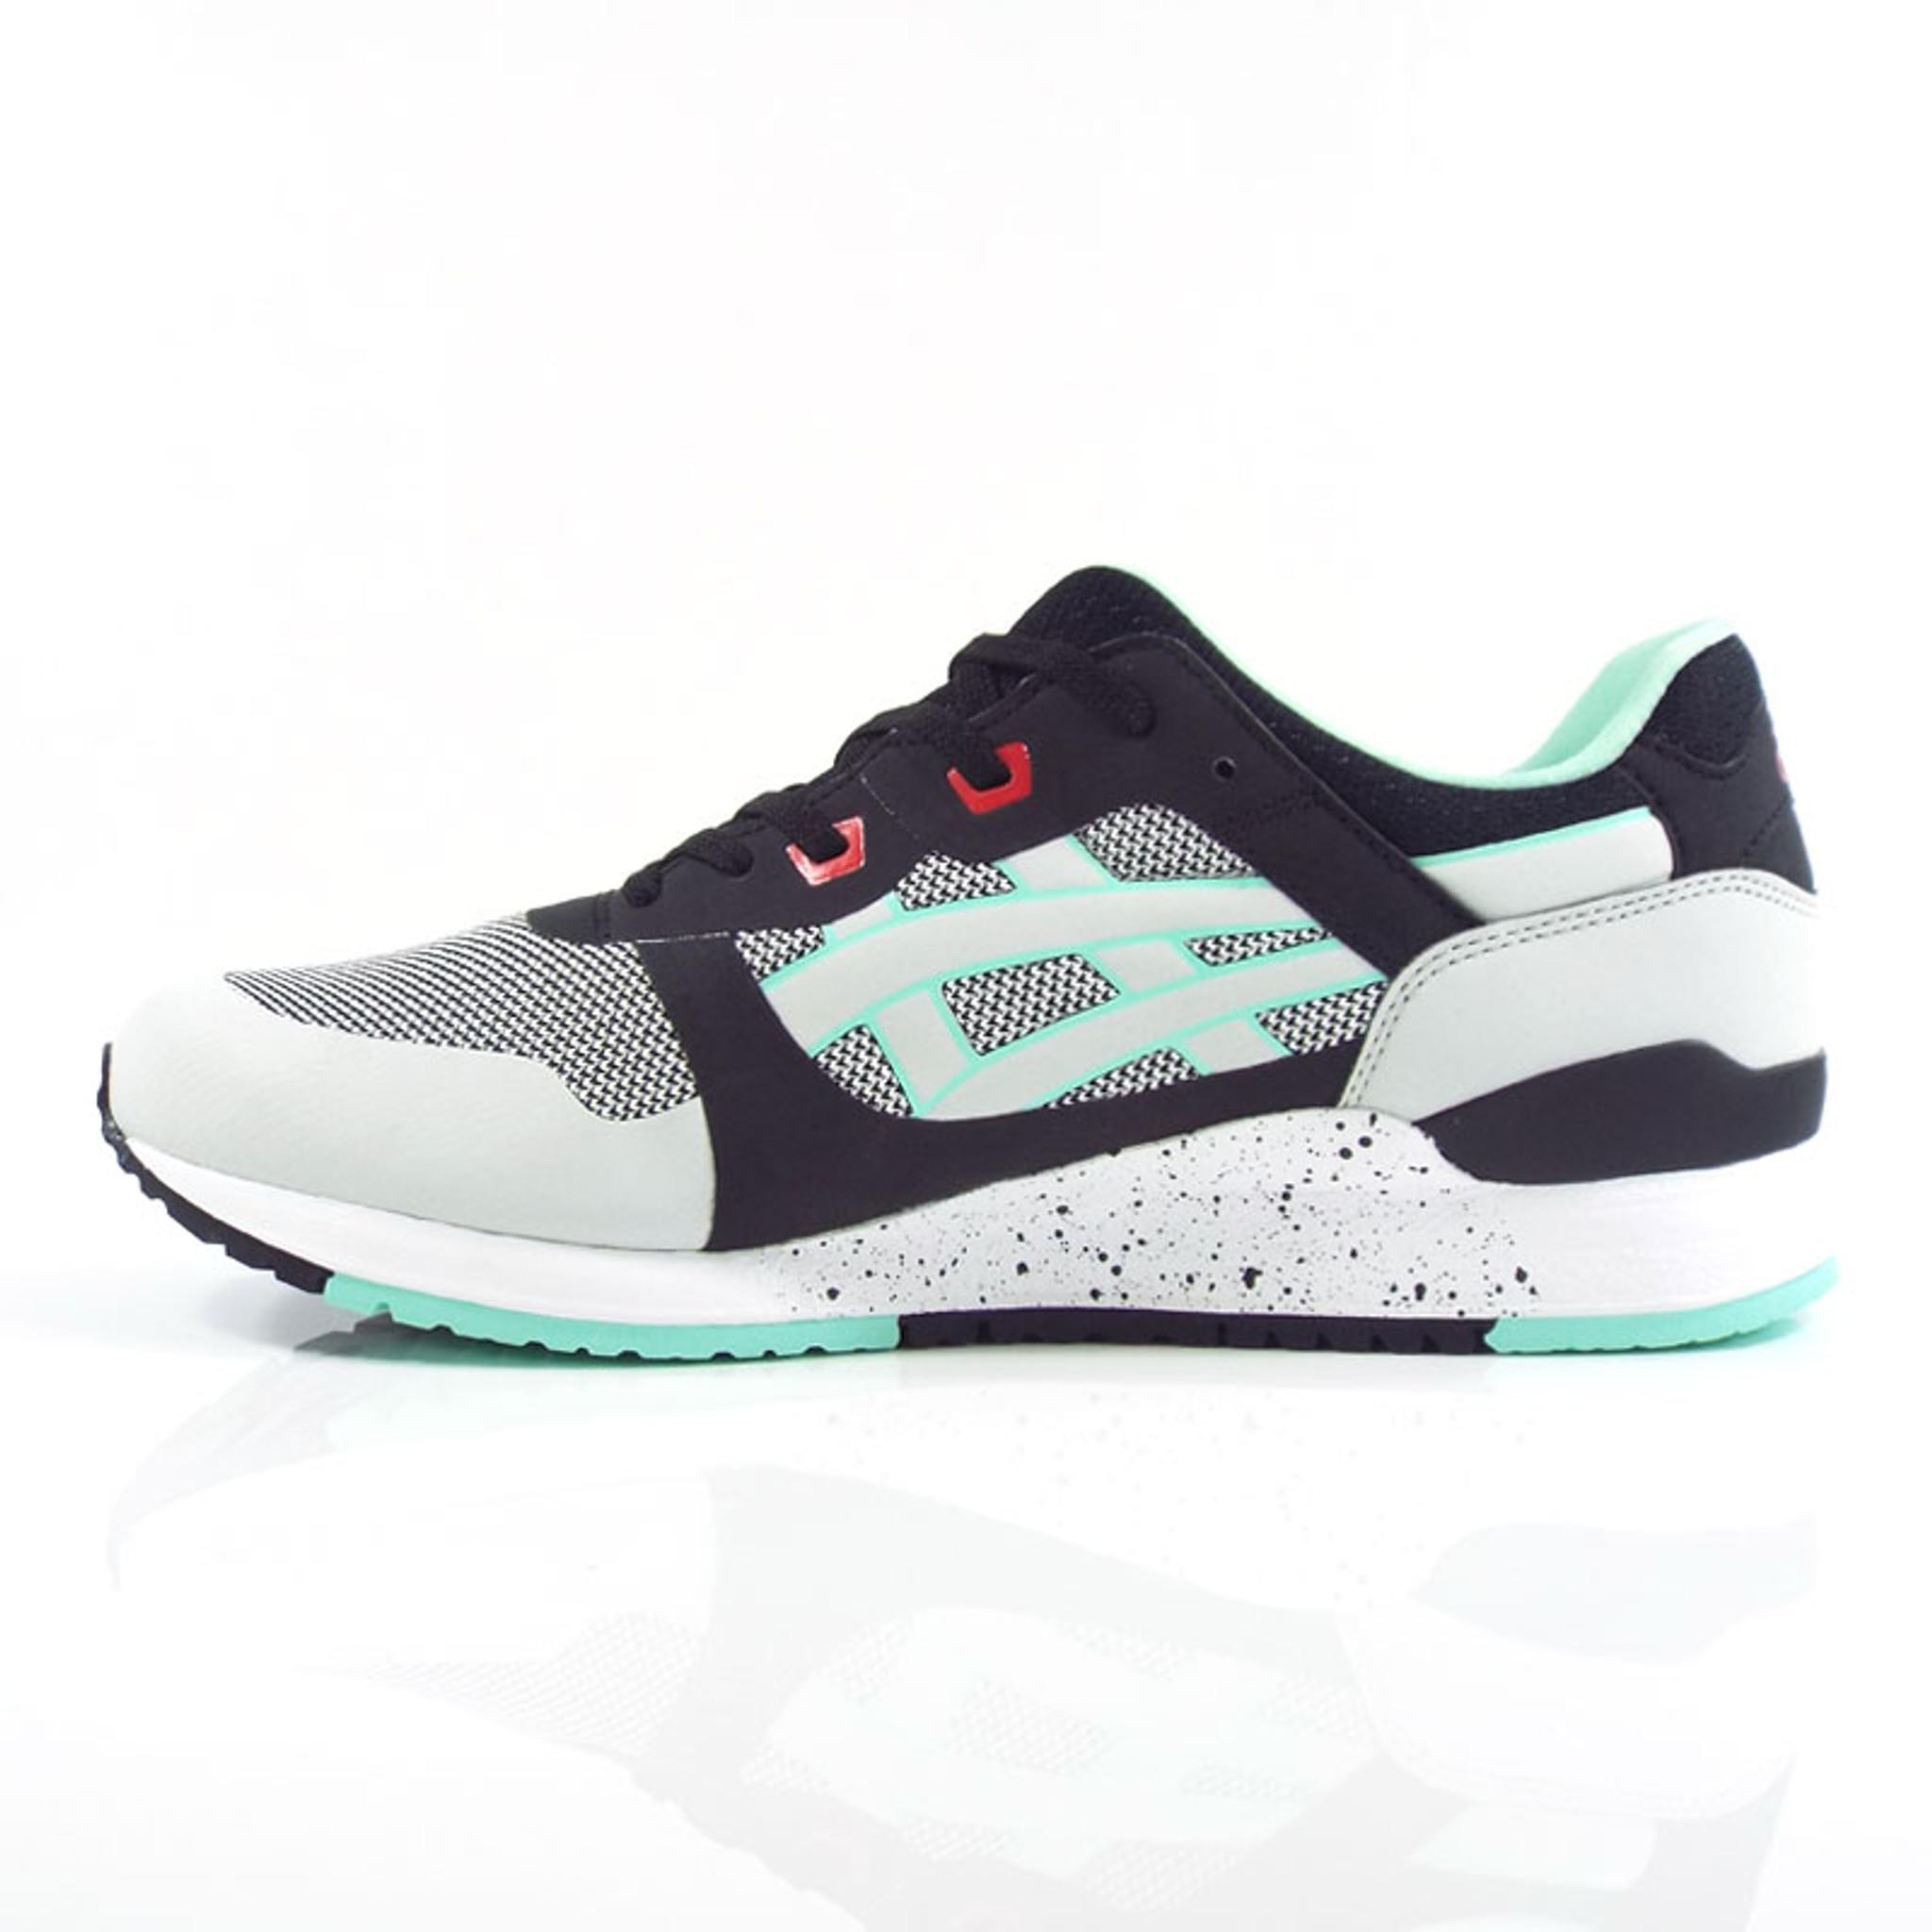 hot sale online 2c88a 42187 Asics Gel Lyte III NS Shoes - Soft Grey/Soft Grey